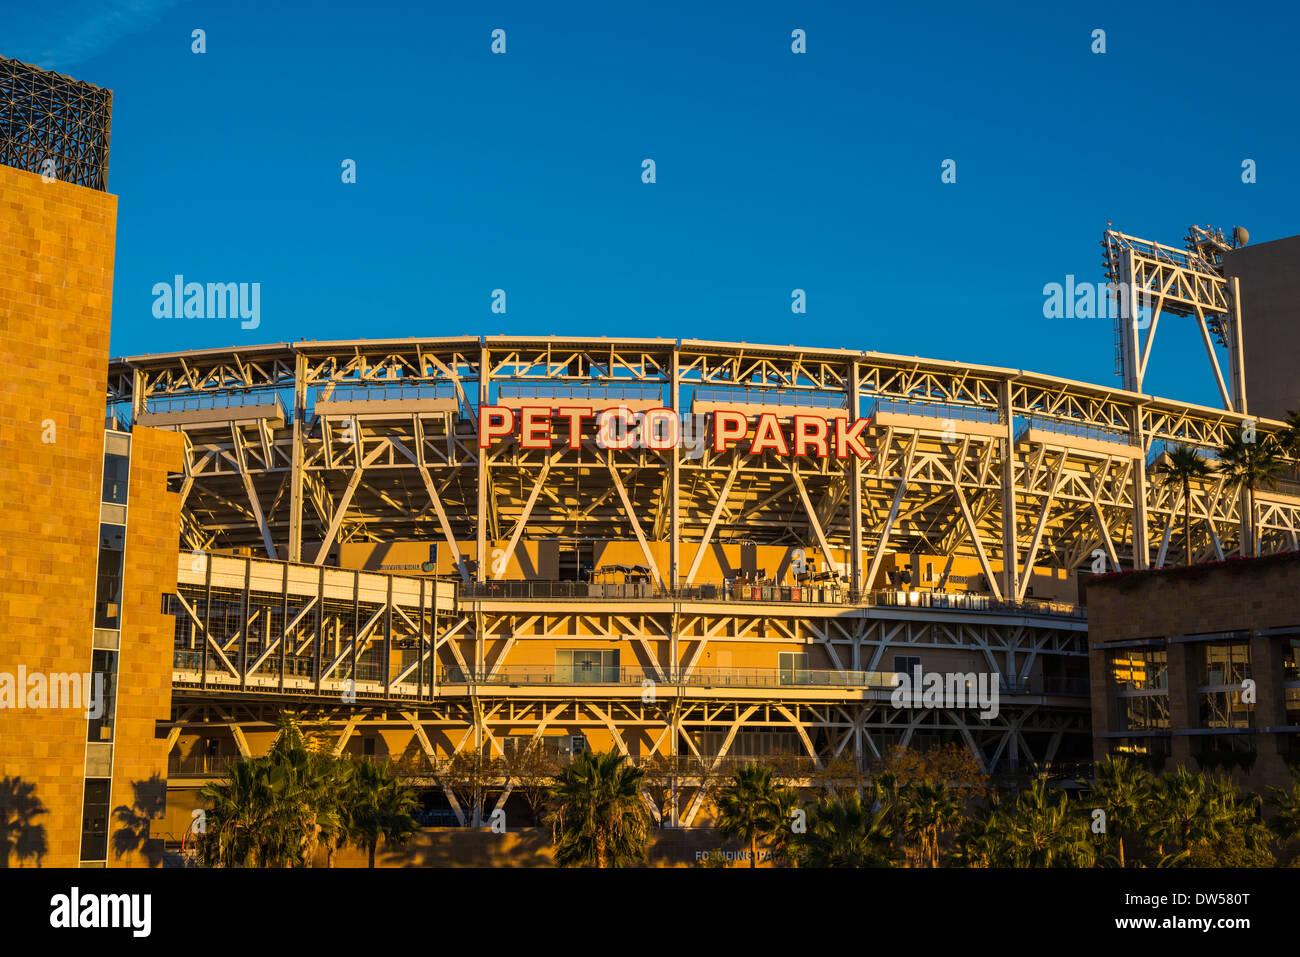 Petco Park. San Diego, California, United States. - Stock Image